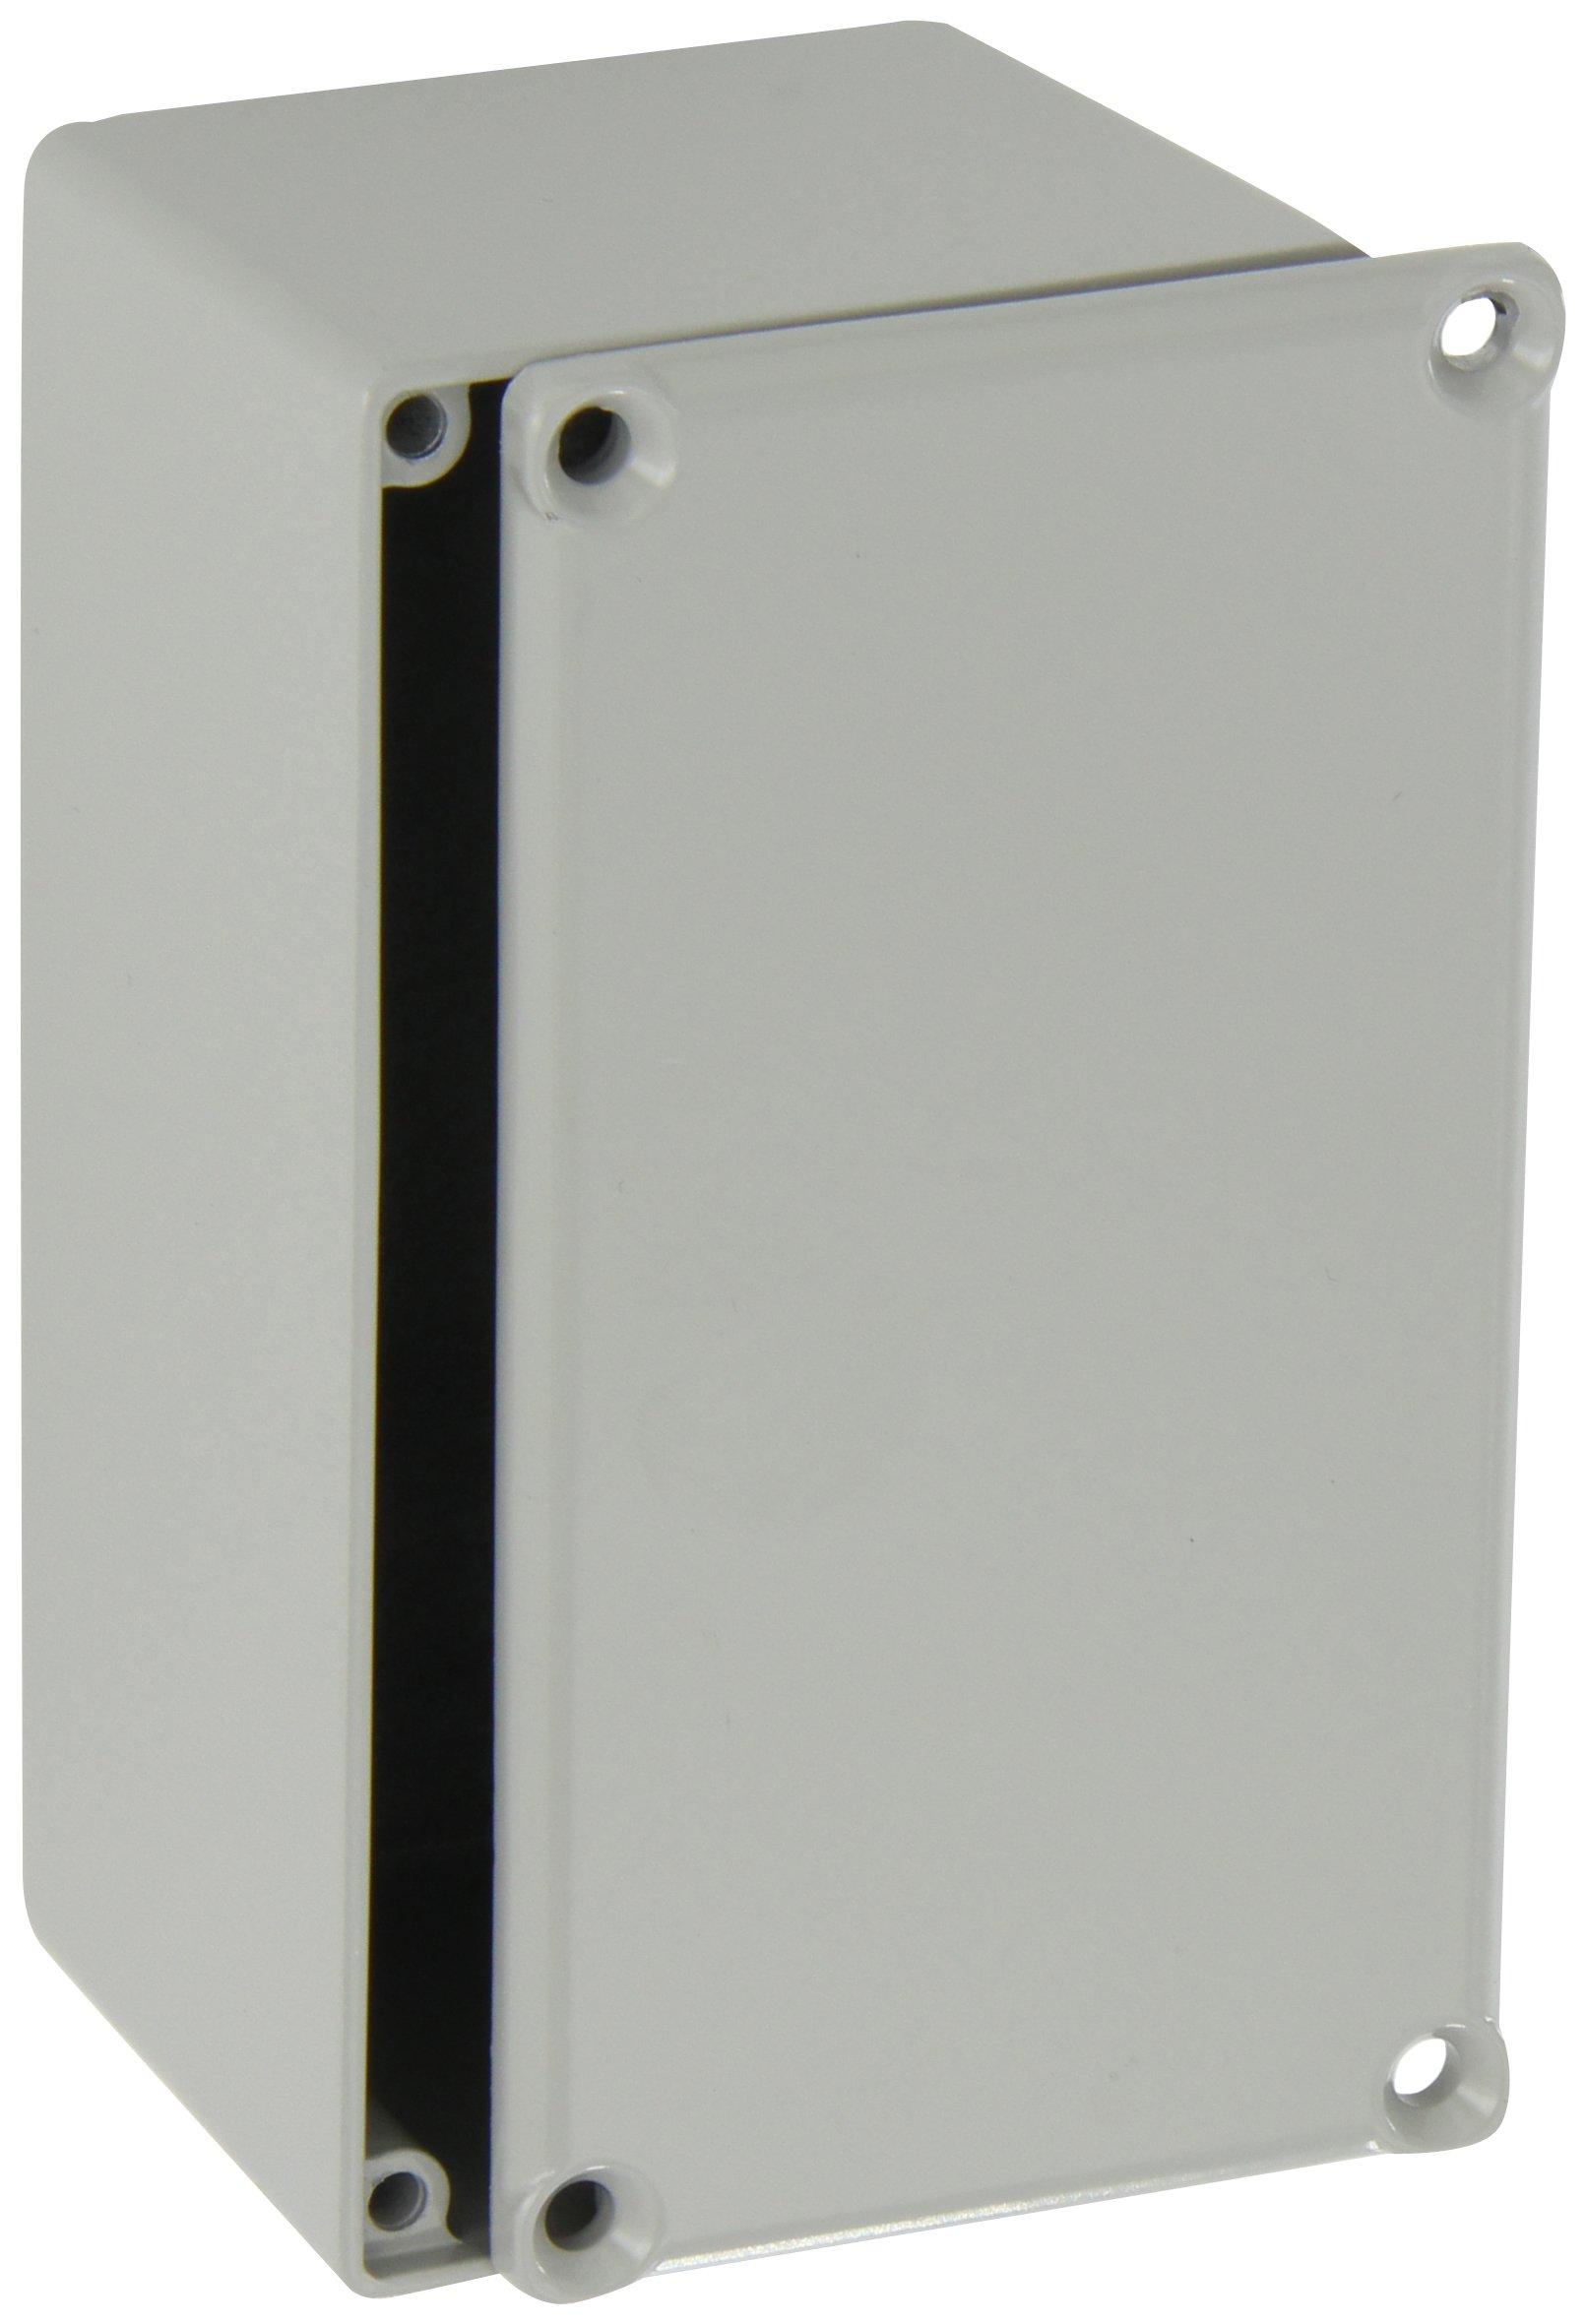 BUD Industries CU-479-G Aluminum Econobox, 4-23/64'' Length x 2-23/64'' Width x 2-1/8'' Height, Gray Painted Finish